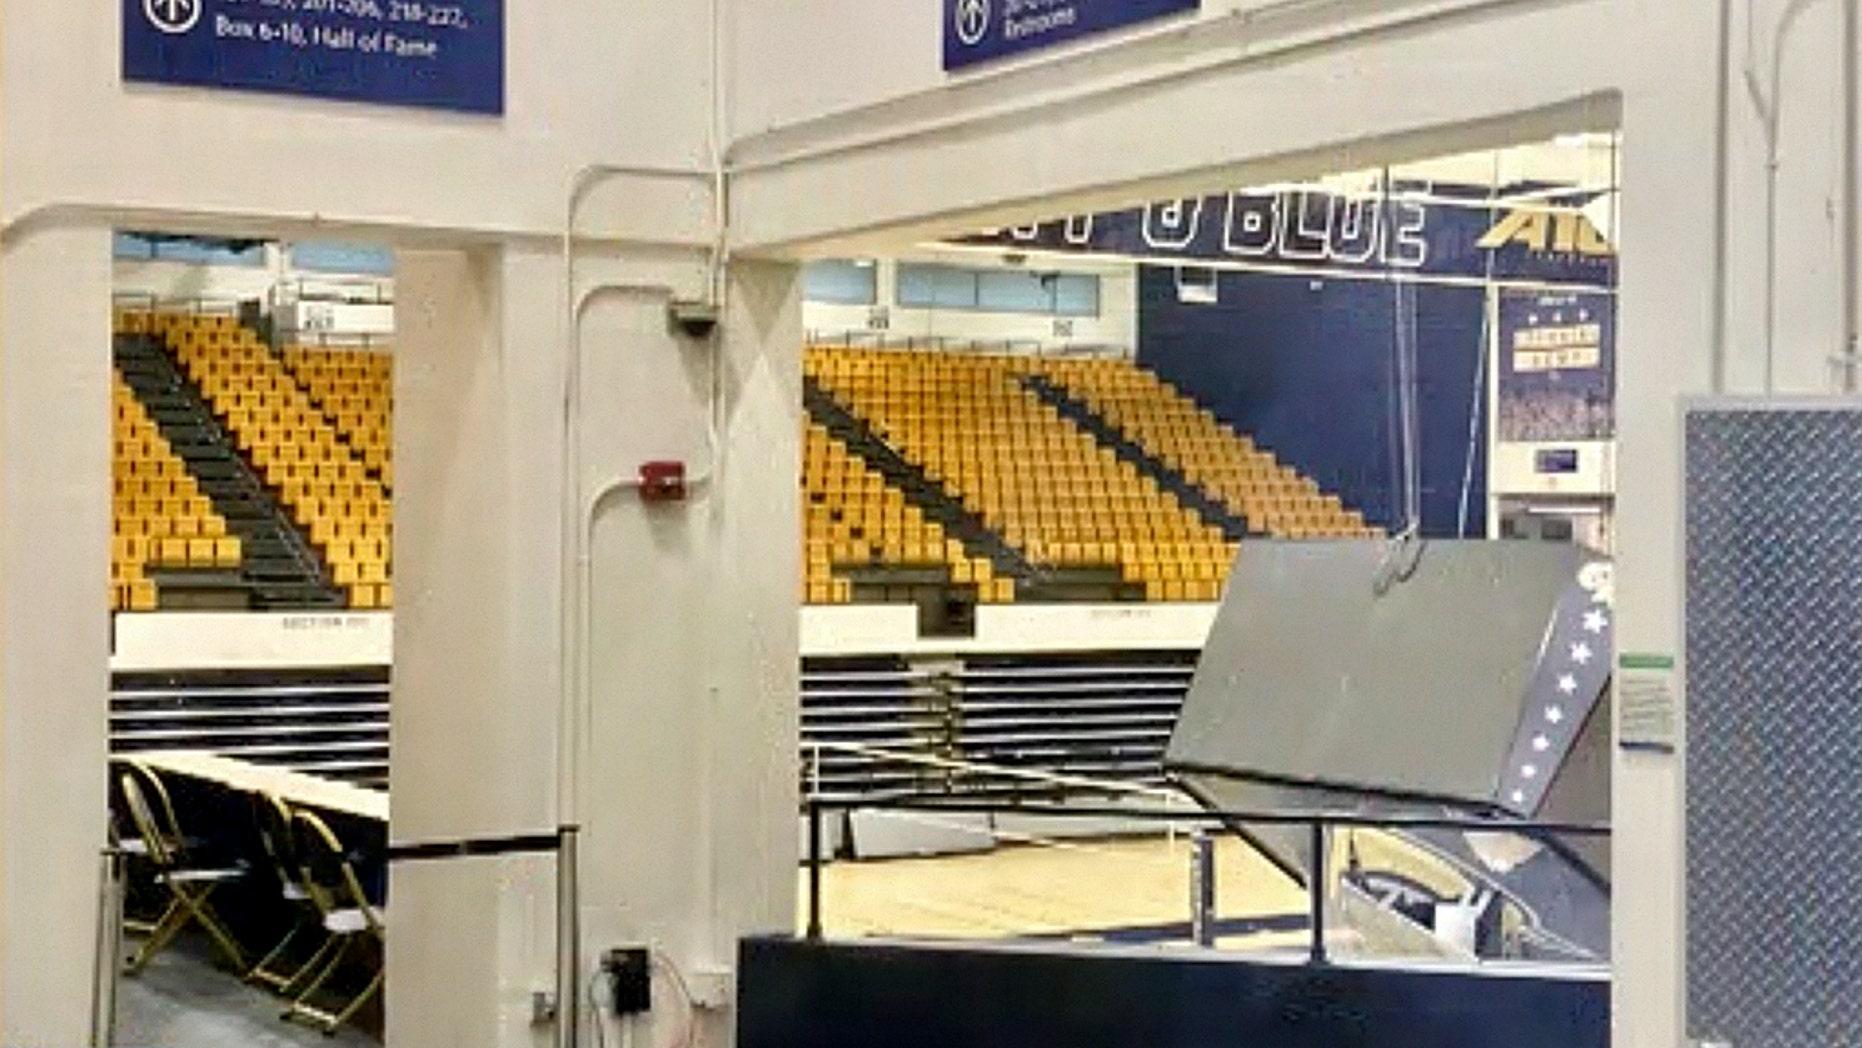 The scoreboard hanging above a George Washington University arena came crashing down on Tuesday.